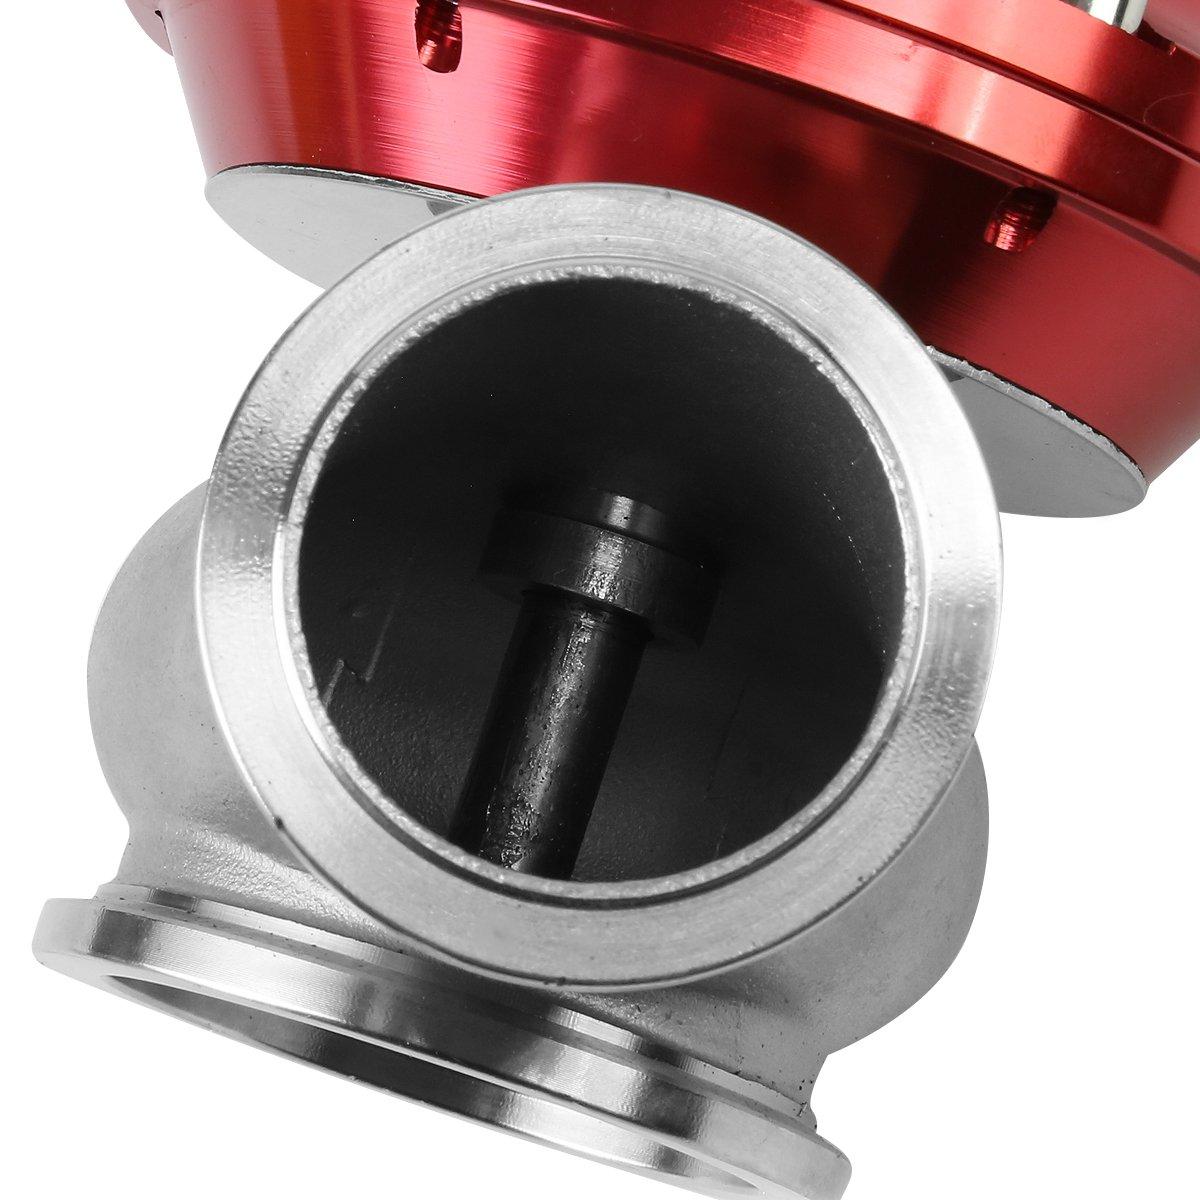 DNA Motoring WG-TL-44MM-RD 44mm External Turbo Manifold Wastegate